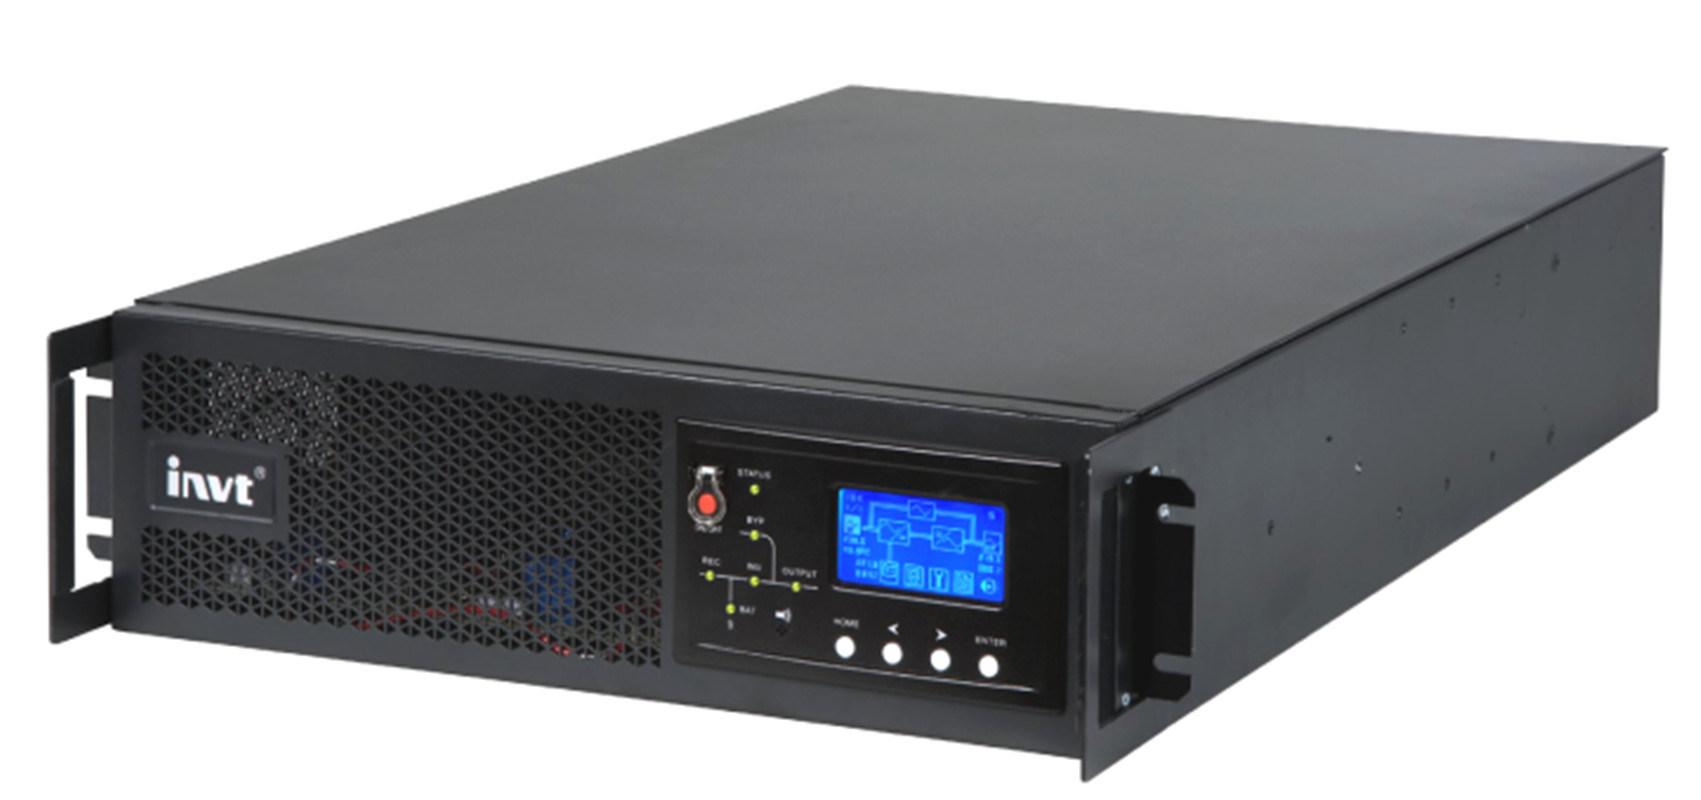 1-10kVA Hr11 Series Rack Online UPS 1-10kVA (220V/230V/240V))